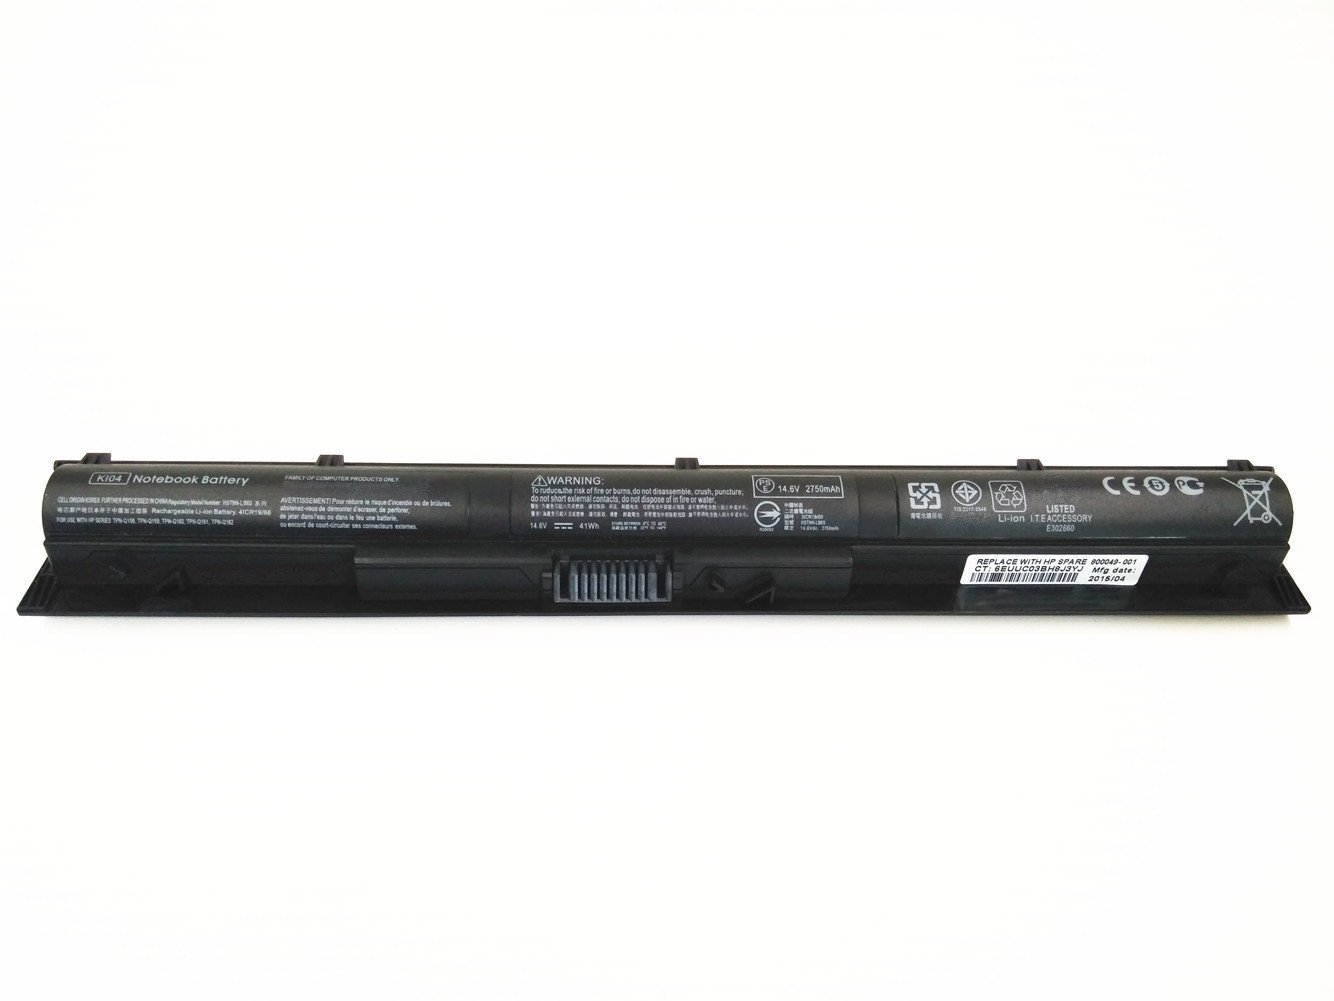 7xinbox 14.6V 41Wh KI04 Repuesto Batería para HP Pavilion 14-ab000 Series HP Pavilion 15-ab000 Series HP Pavilion 17-g000 Series,HP HSTNN-LB6S/DB6T ...